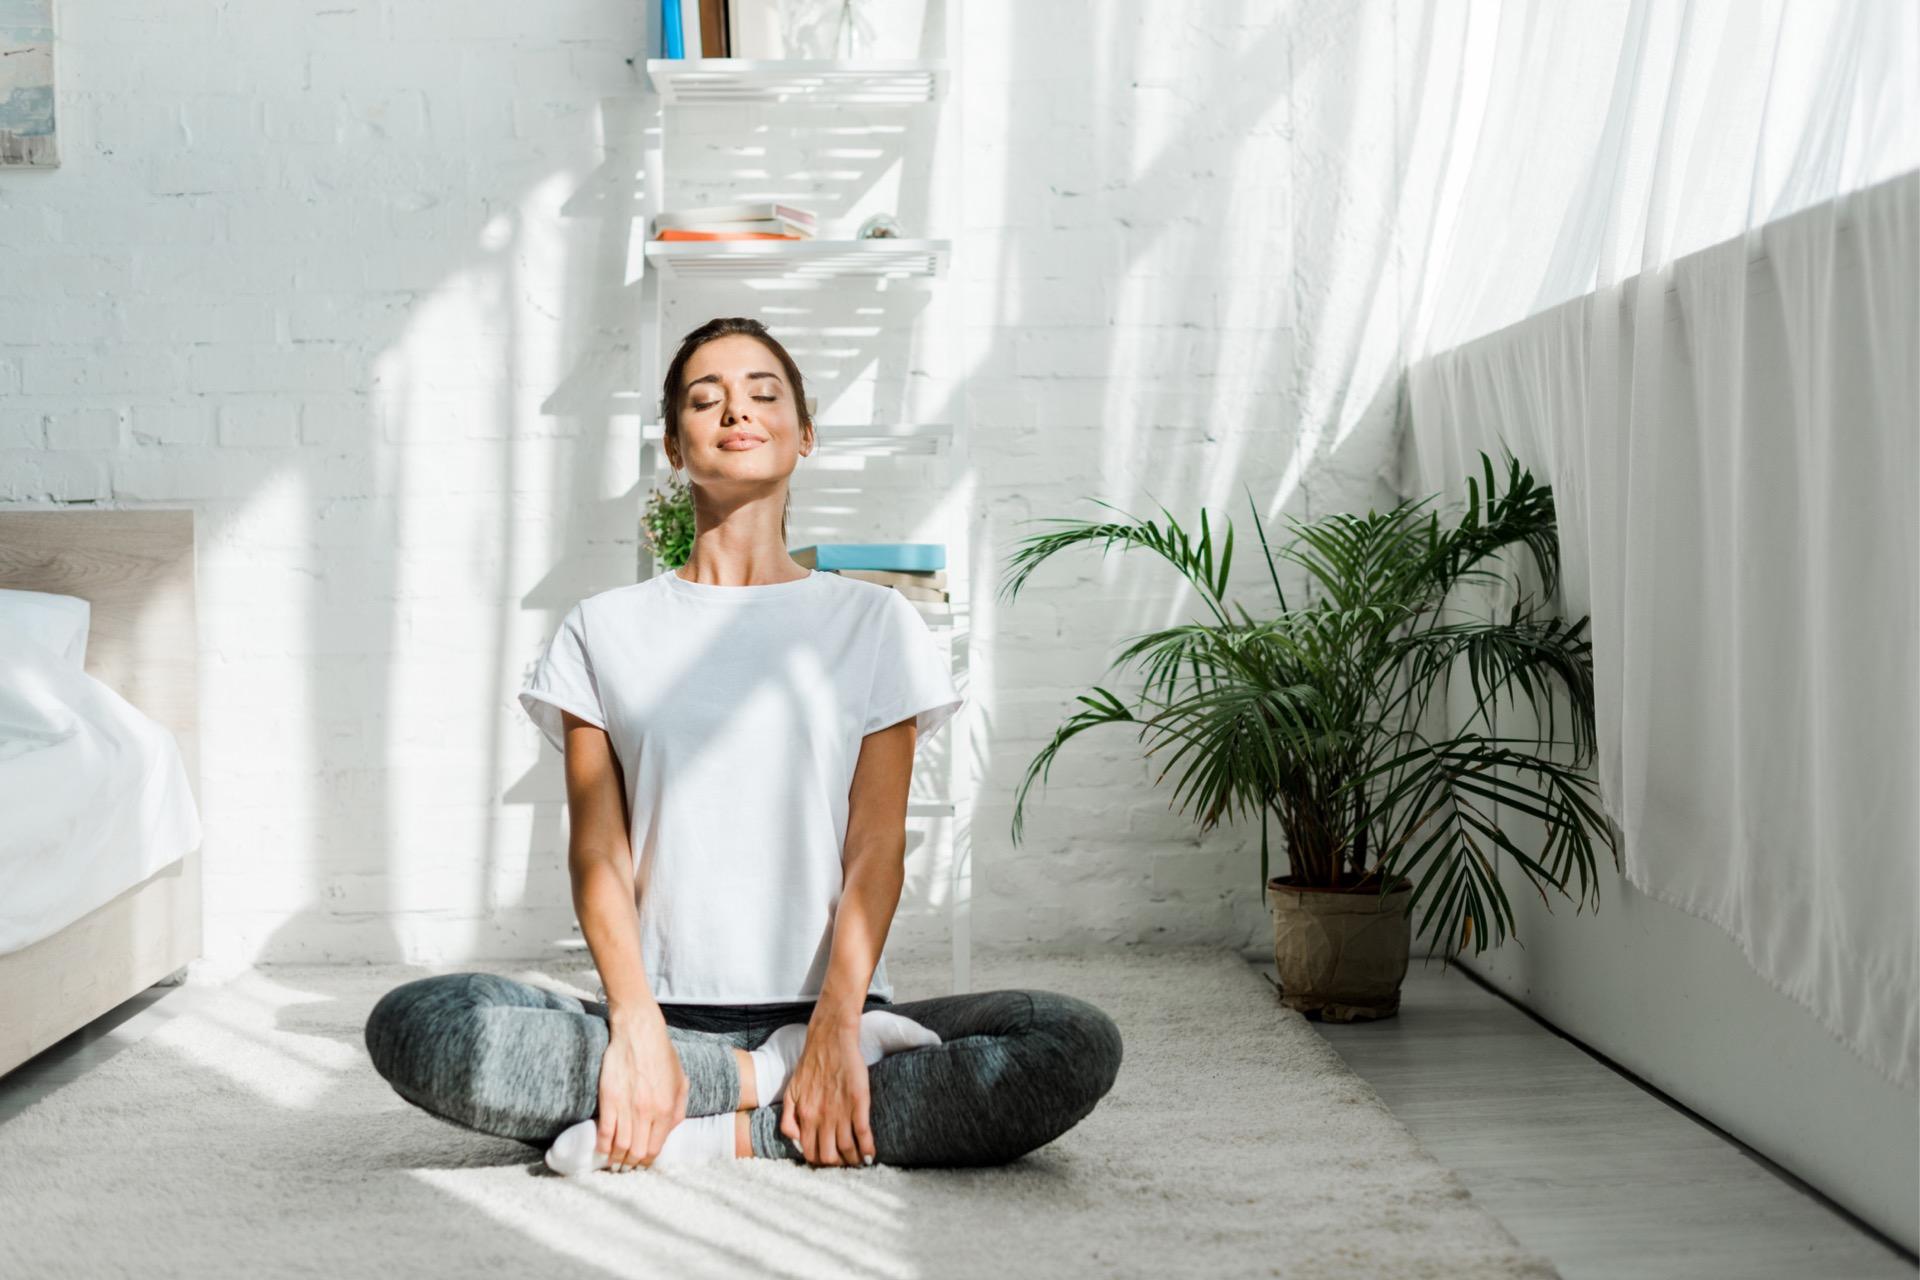 September: National Yoga Awareness Month